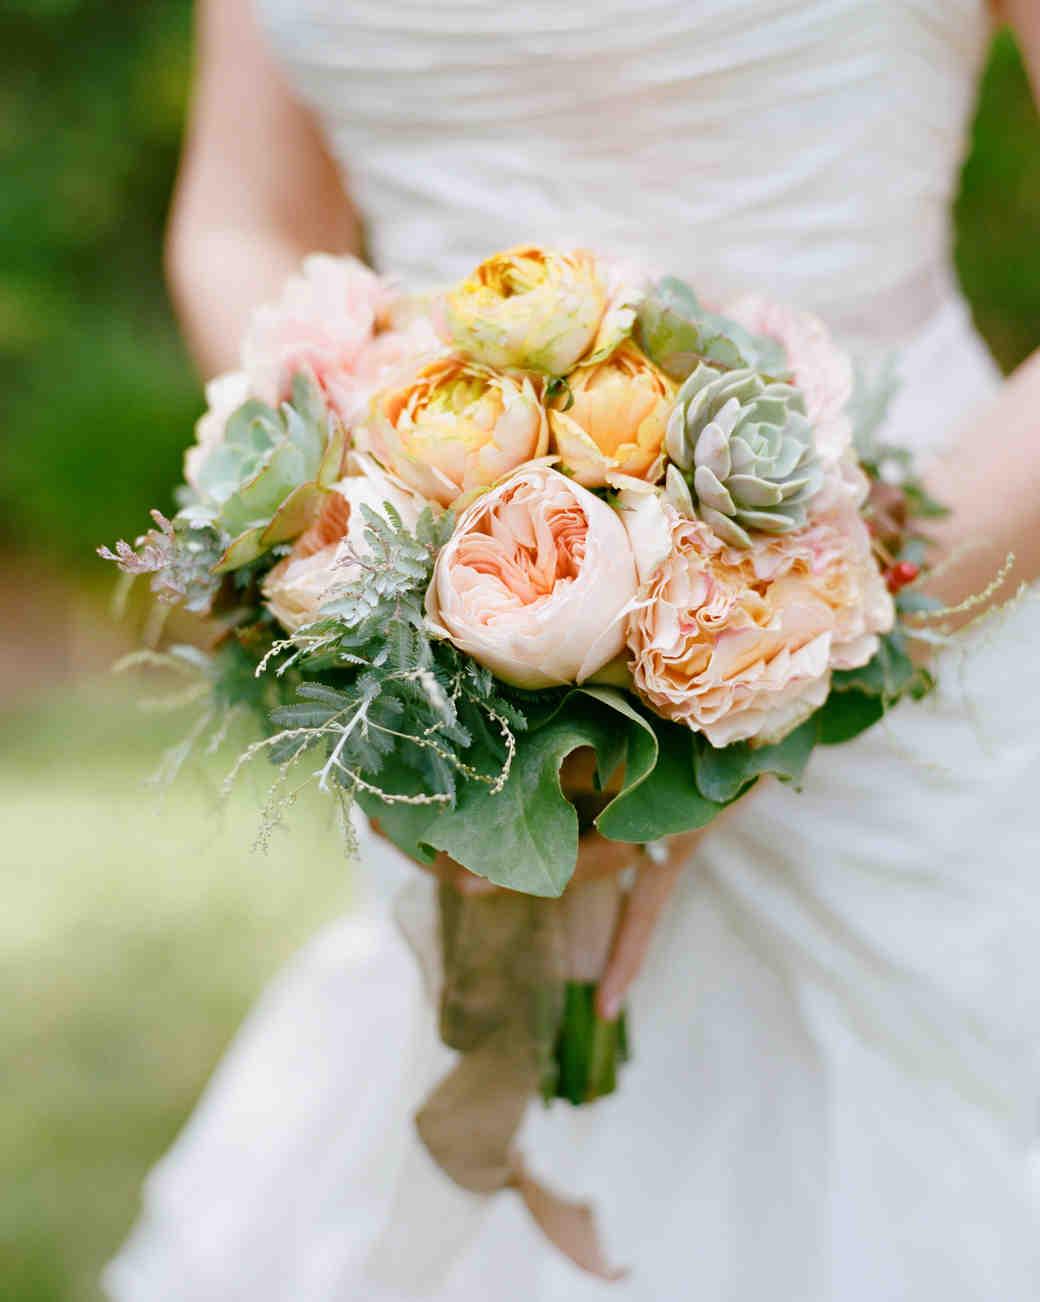 liz-allen-wedding-bouquet-0095-s111494-0914.jpg